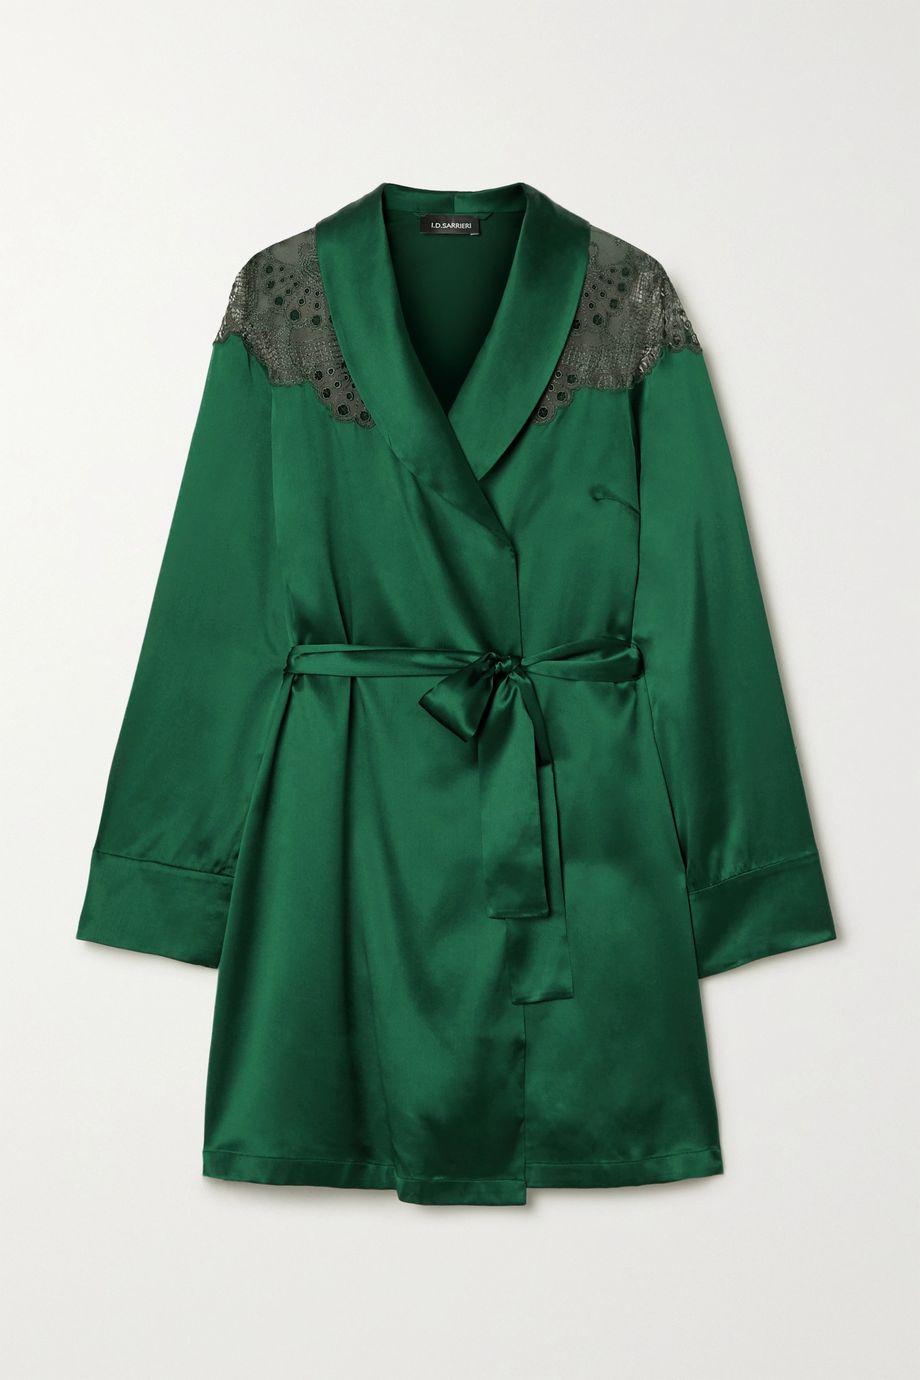 I.D. Sarrieri Embroidered tulle-trimmed silk-blend satin robe